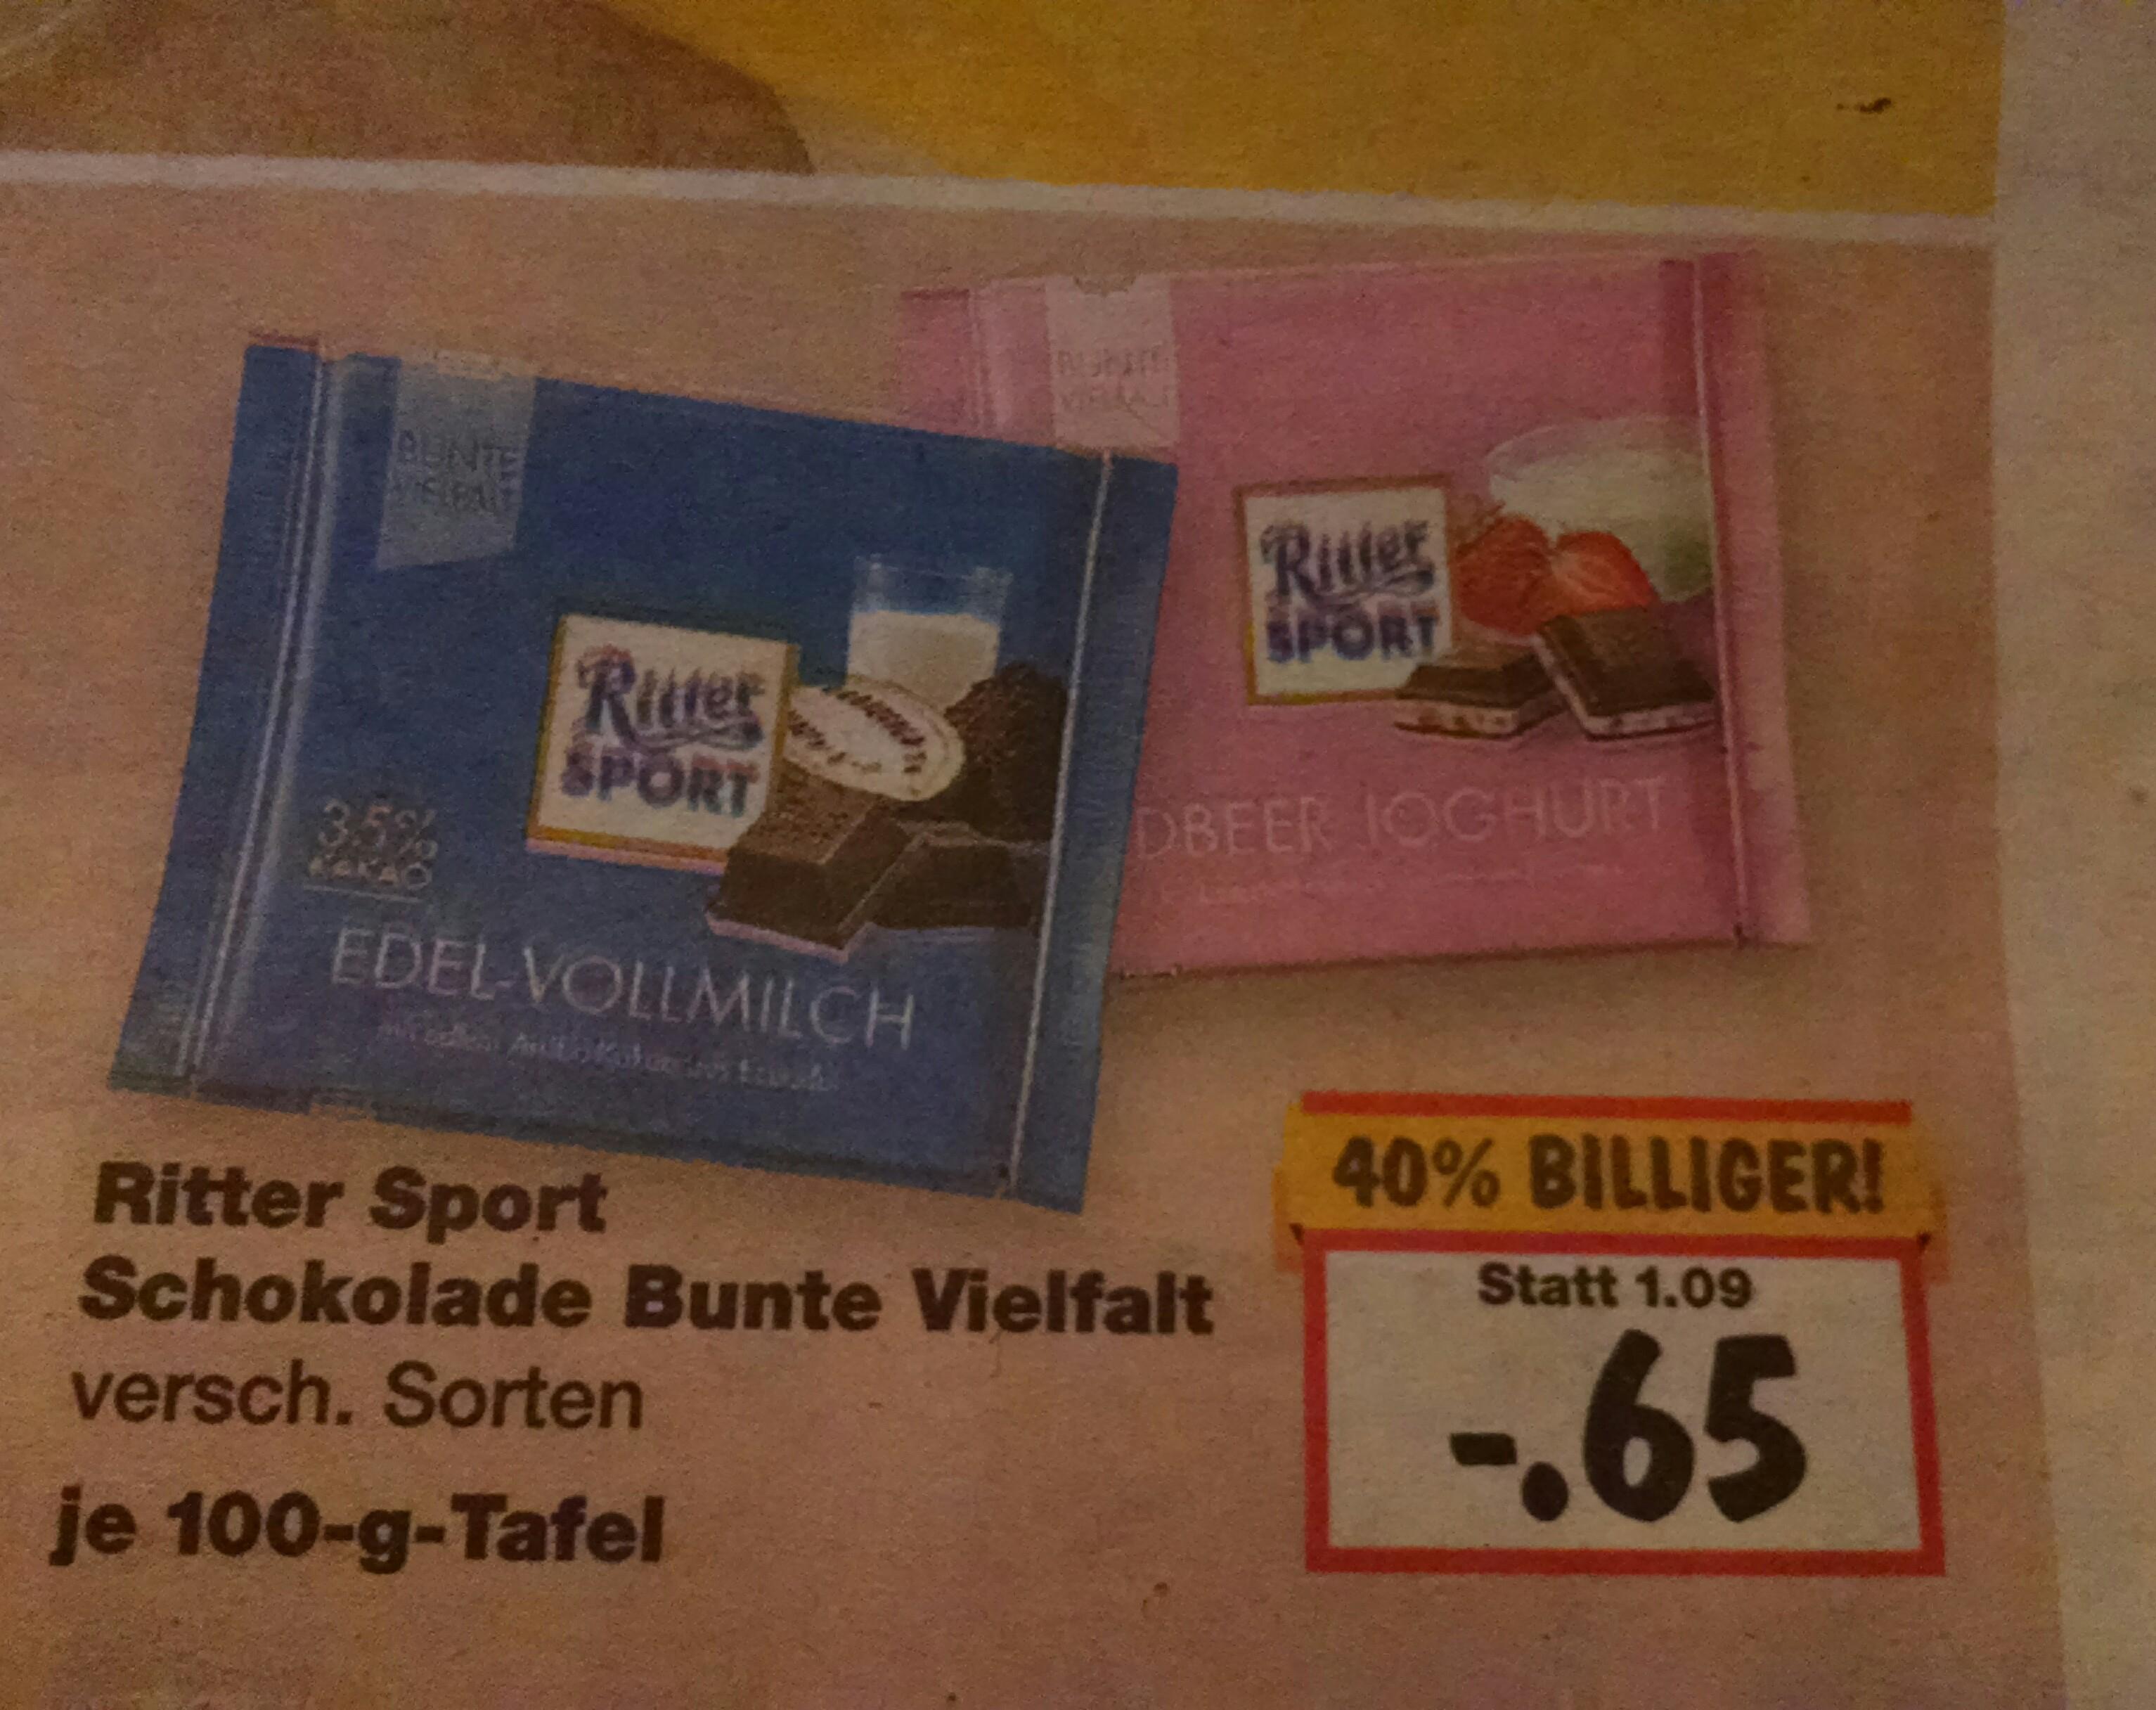 Kaufland bundesweit Ritter Sport 40% billiger